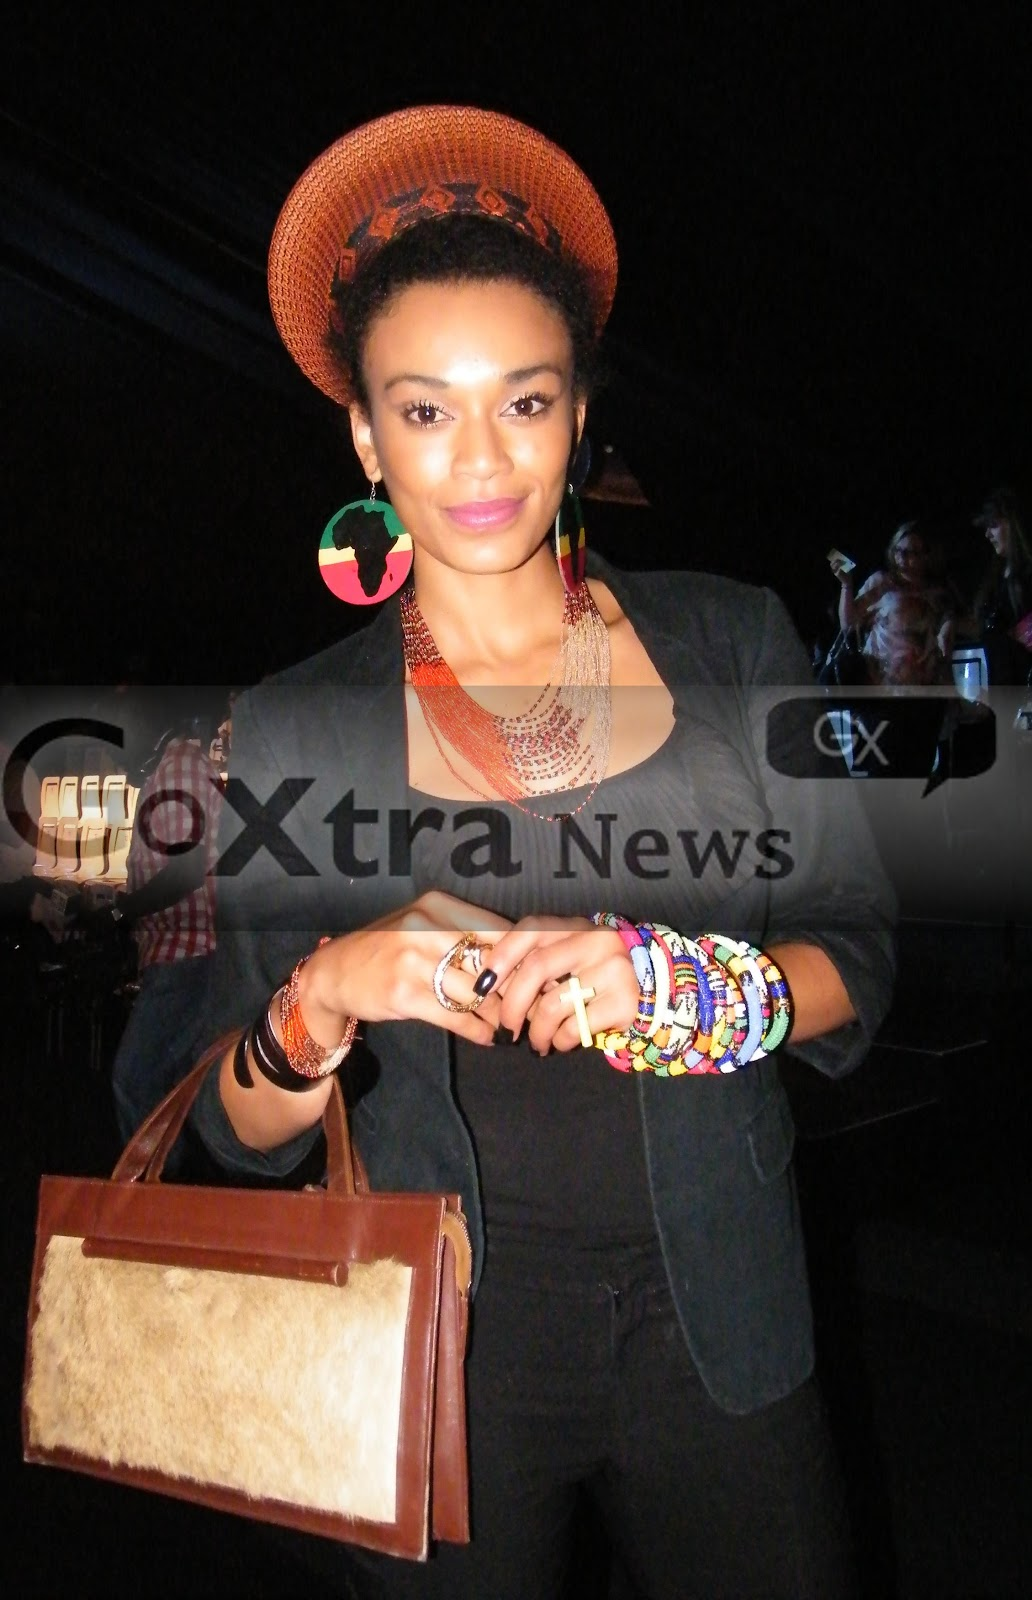 http://3.bp.blogspot.com/-sVmJwSZEy8Y/UI-ZtUNPeFI/AAAAAAAAGZ8/LlxW3fclNbw/s1600/Pearl_Thusi_Mercedes_Benz_Fashion_Week.JPG